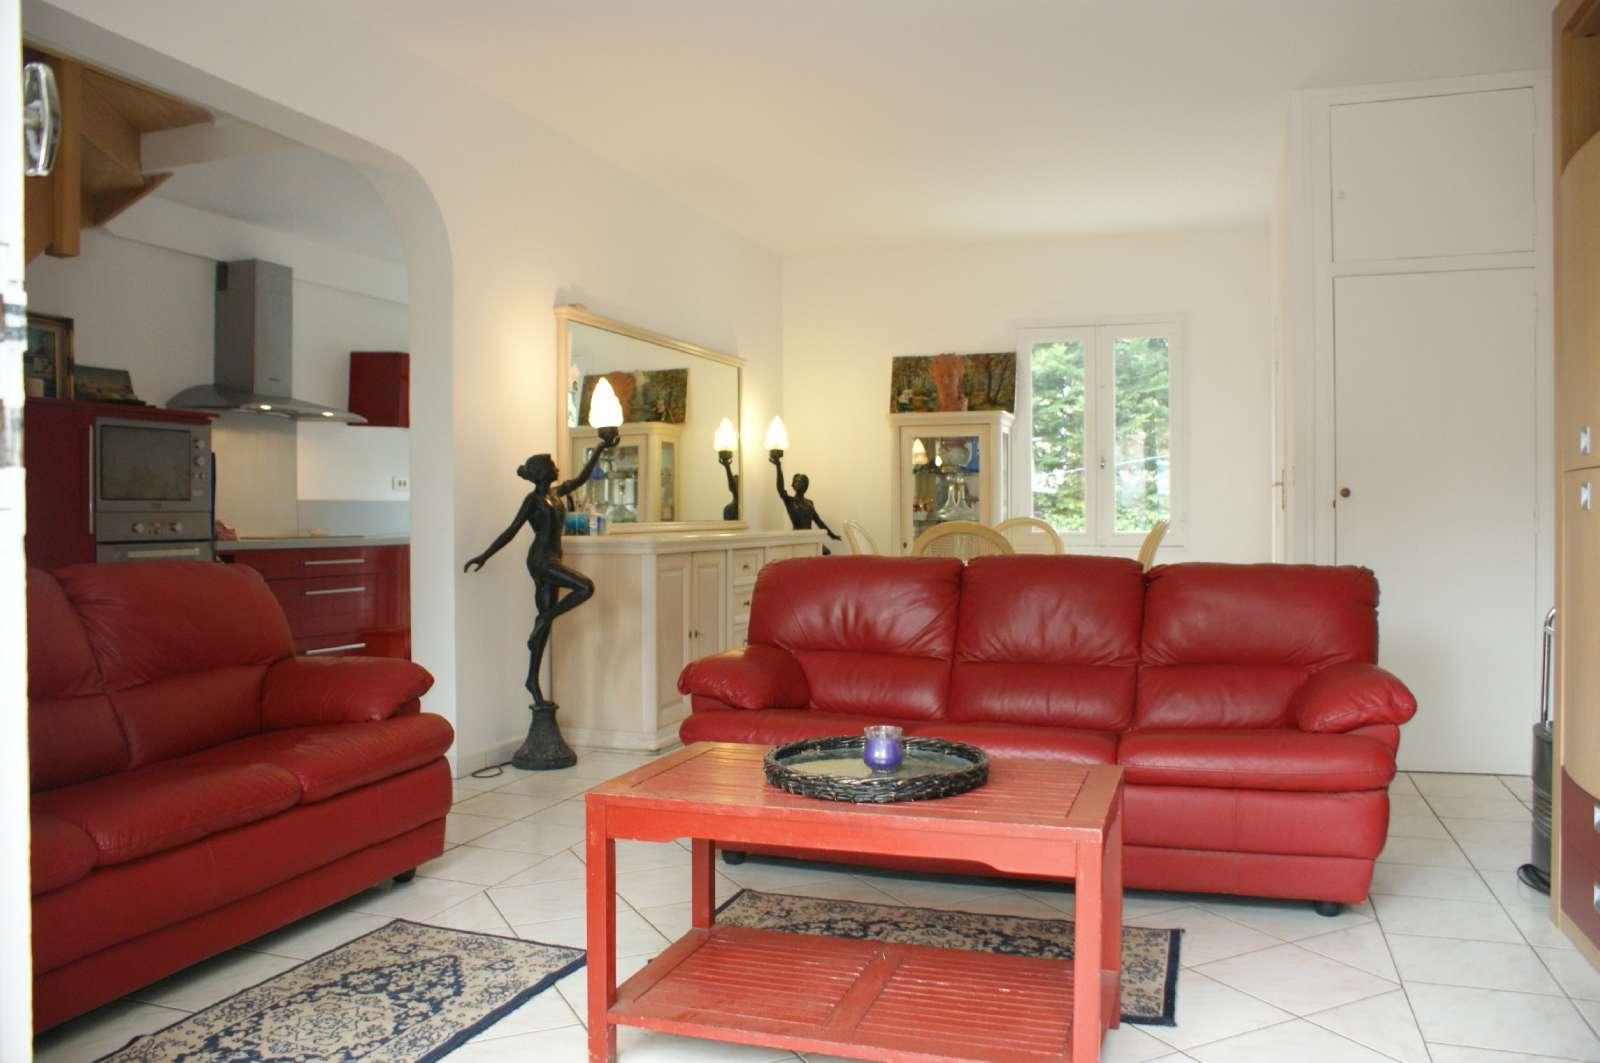 location villa arcachon 33120 passion immo d co. Black Bedroom Furniture Sets. Home Design Ideas